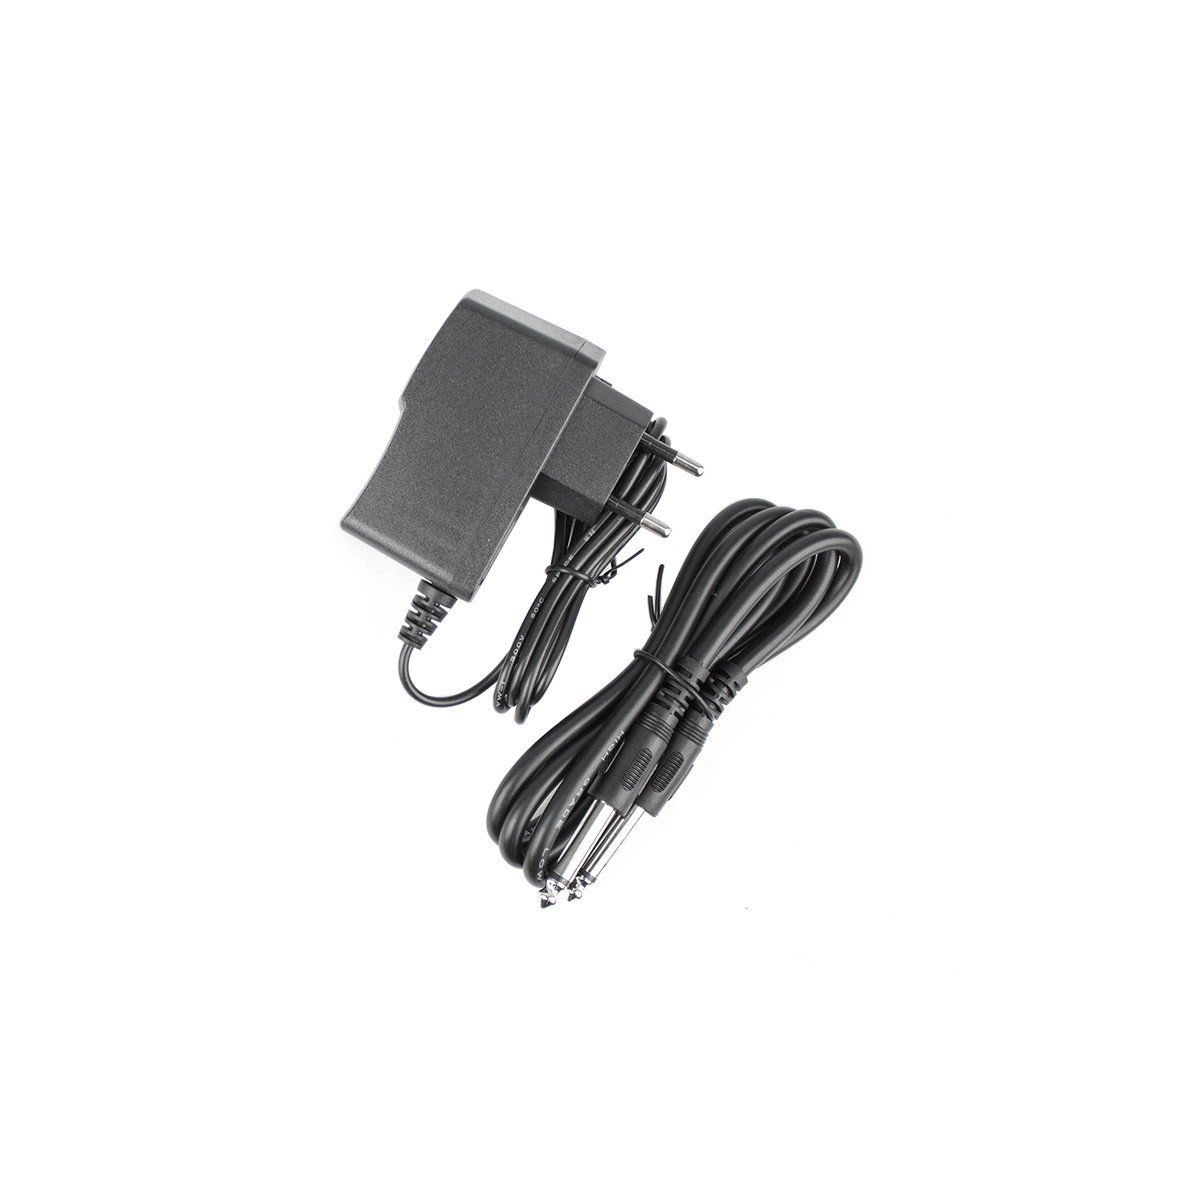 MICROFONE S/FIO DUPLO UHF UD-2200UHF